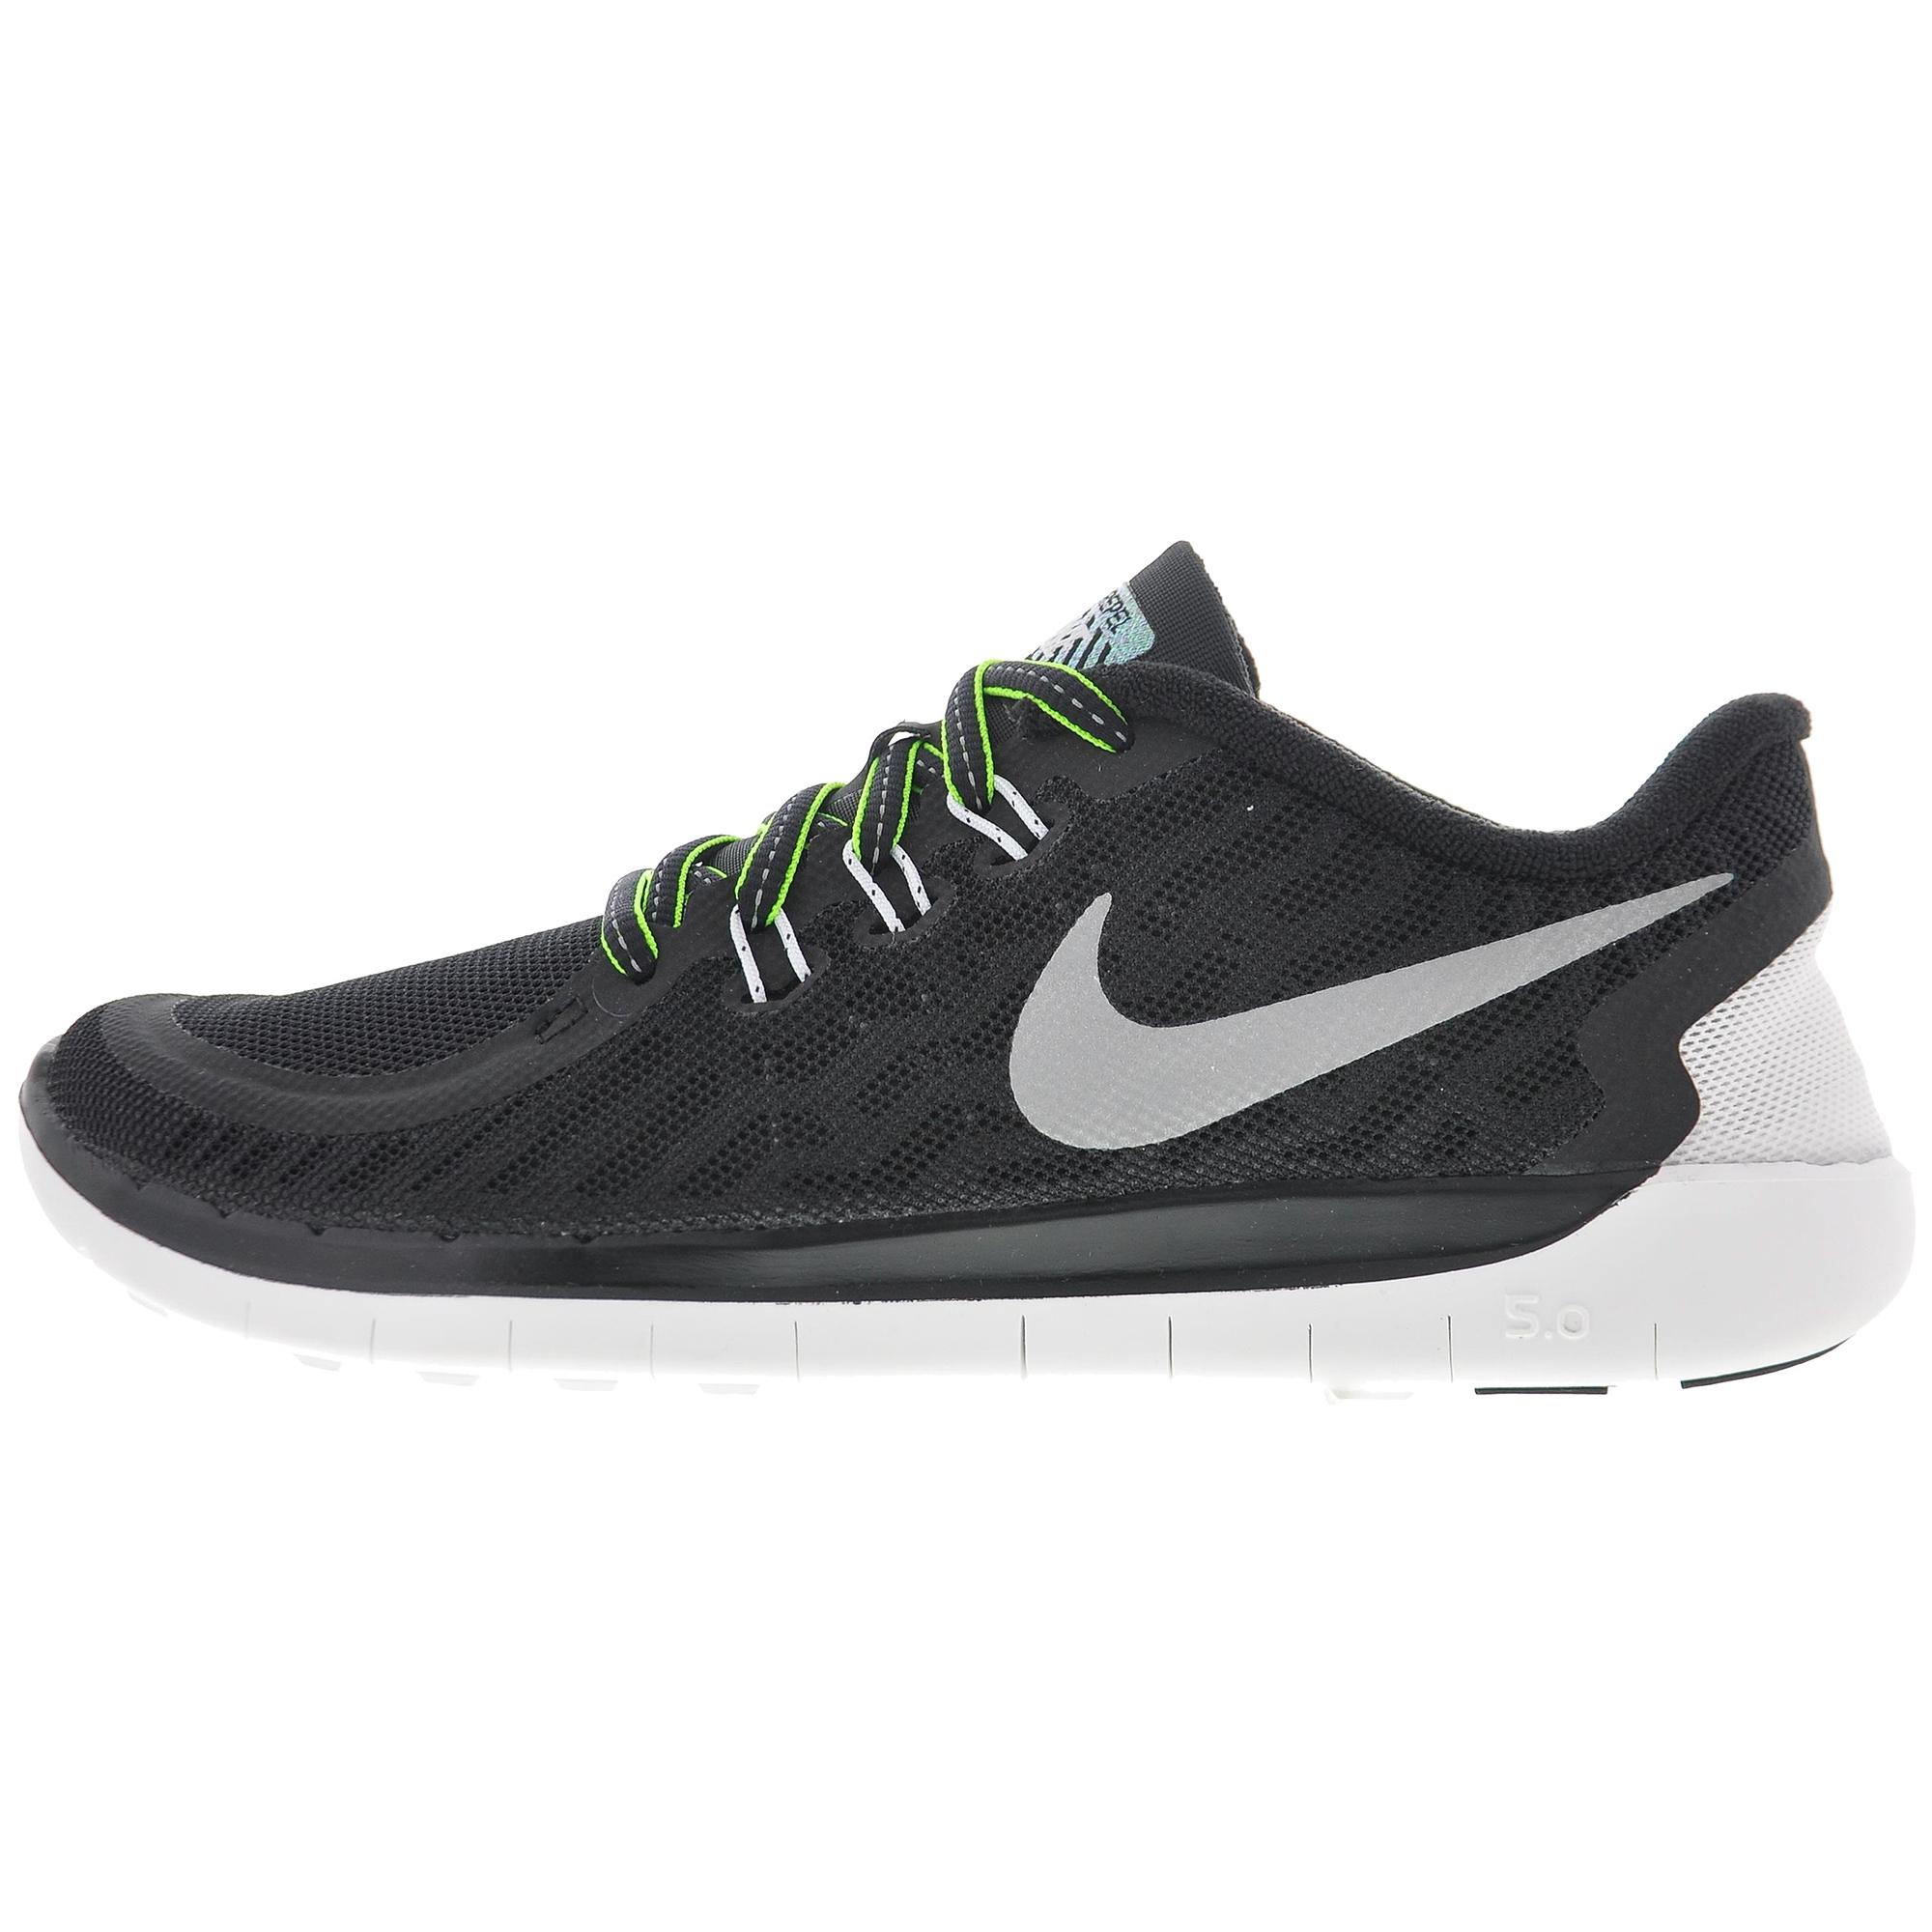 nike free 5.0 flash (gs) spor ayakkabı